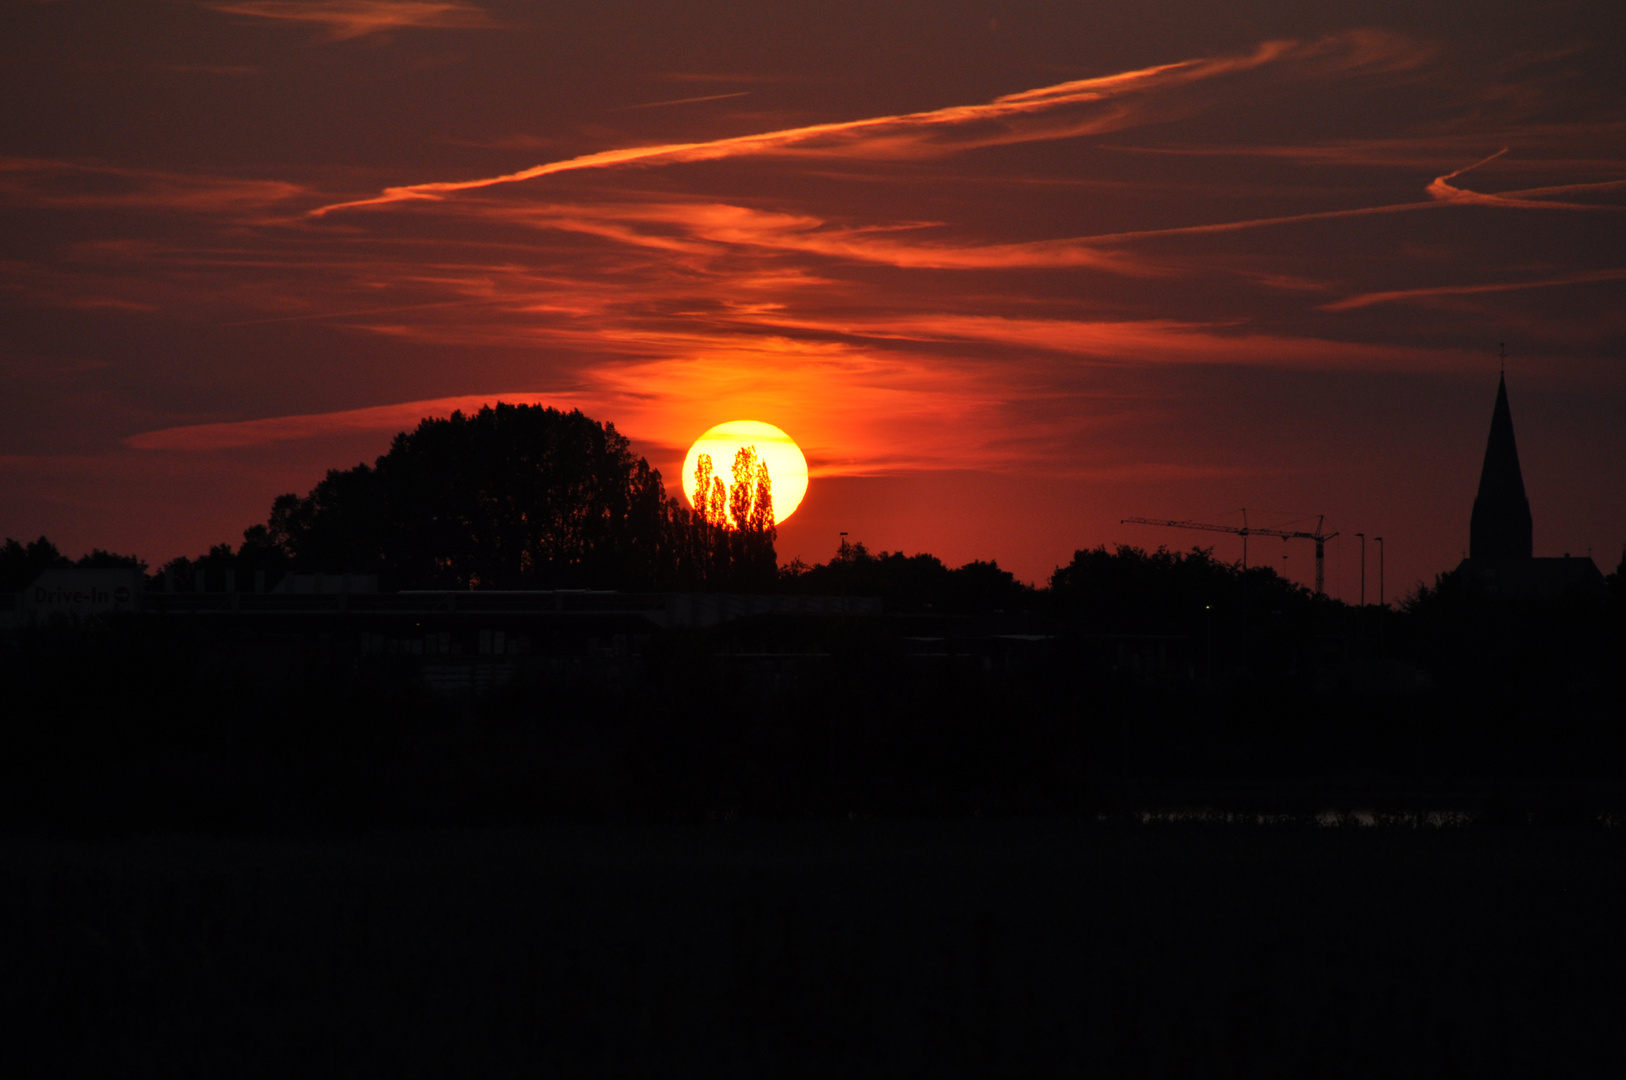 Sonnenuntergang über Goch